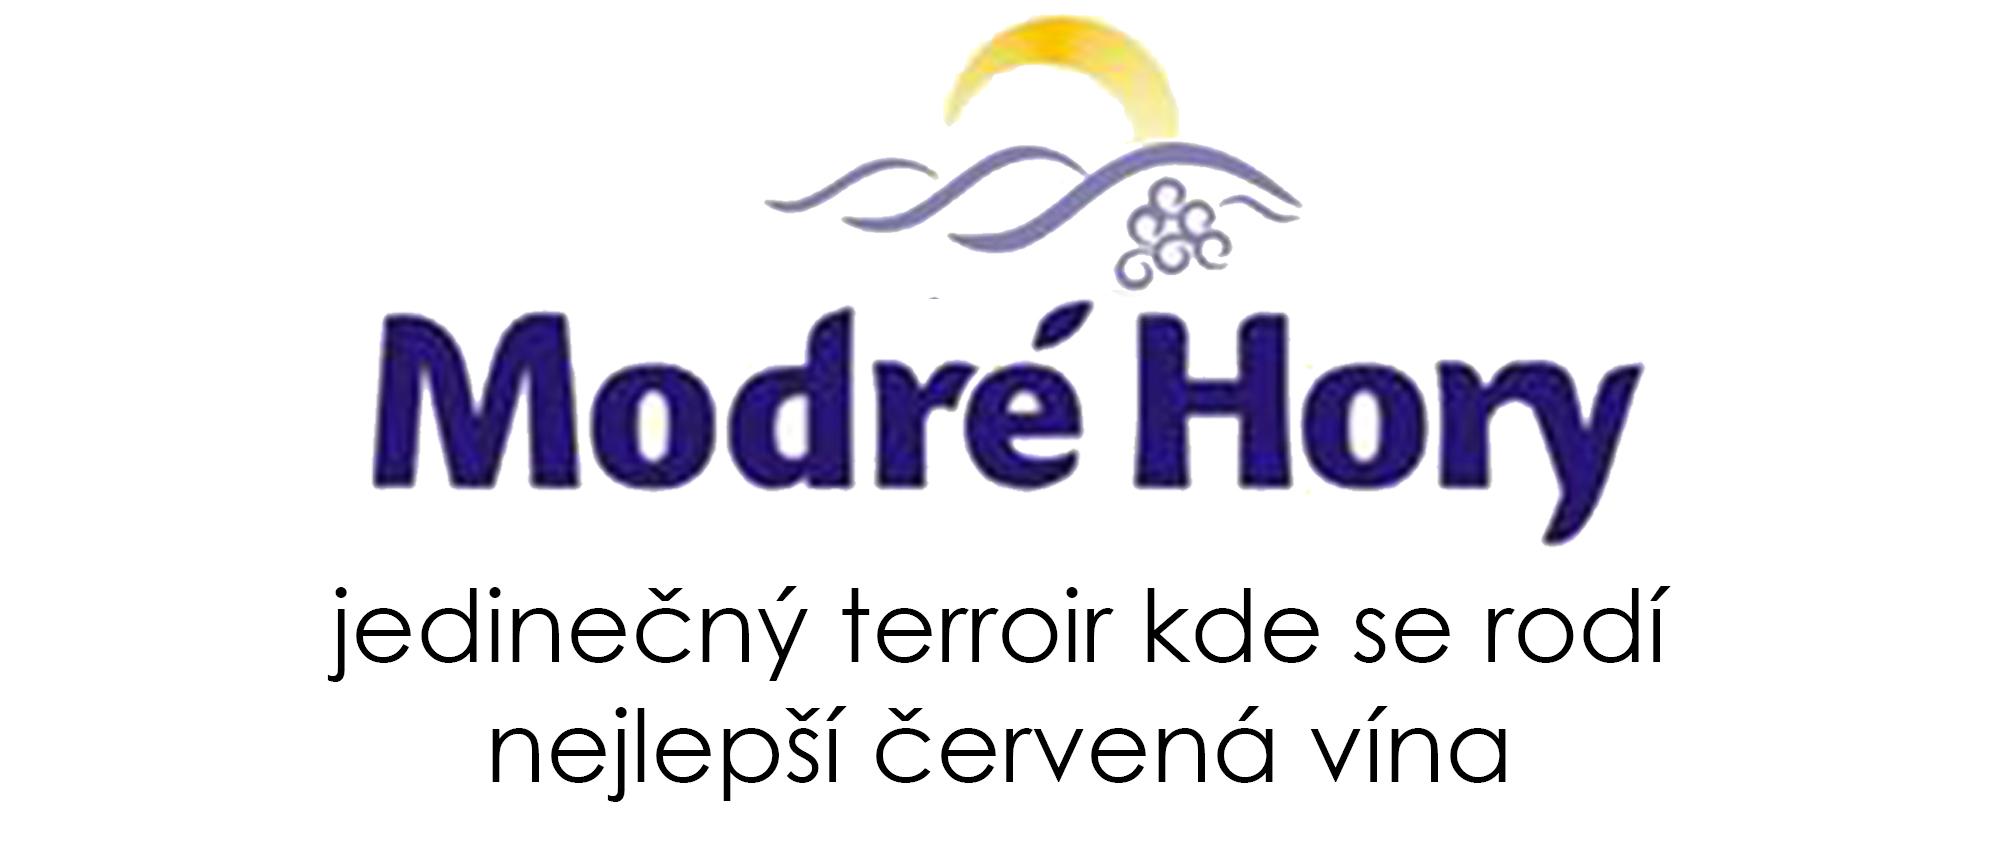 MODREHORY_2_1